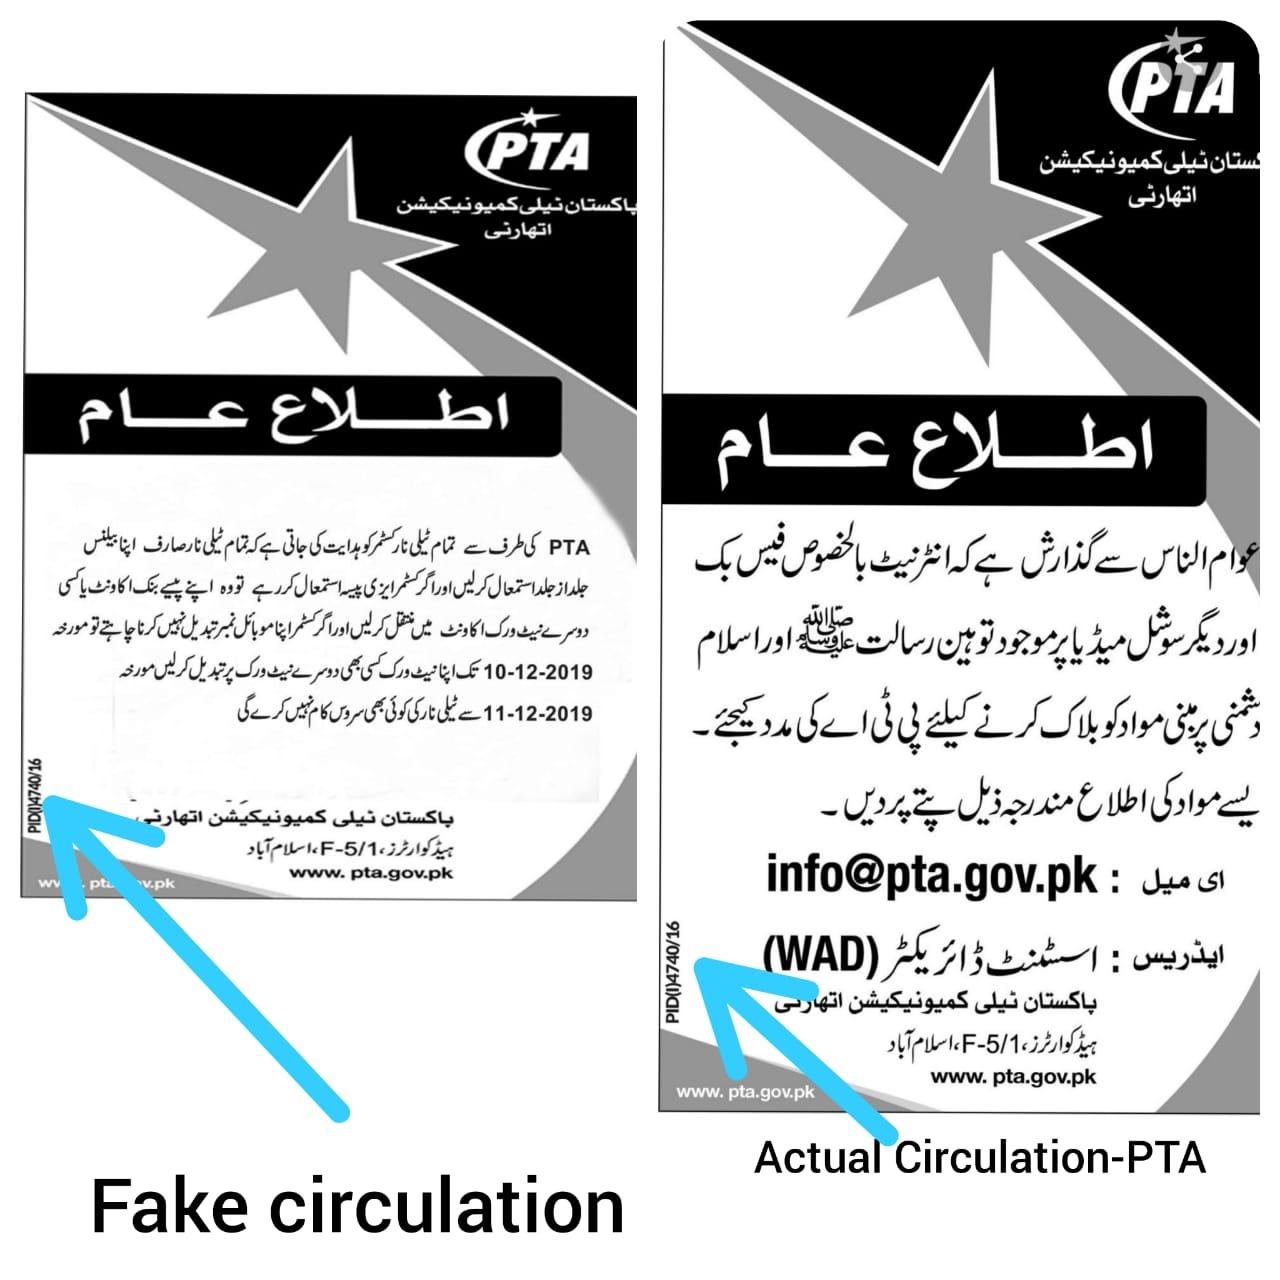 PTA Notice Regarding Telenor Service Suspension is Fake: Spokesperson